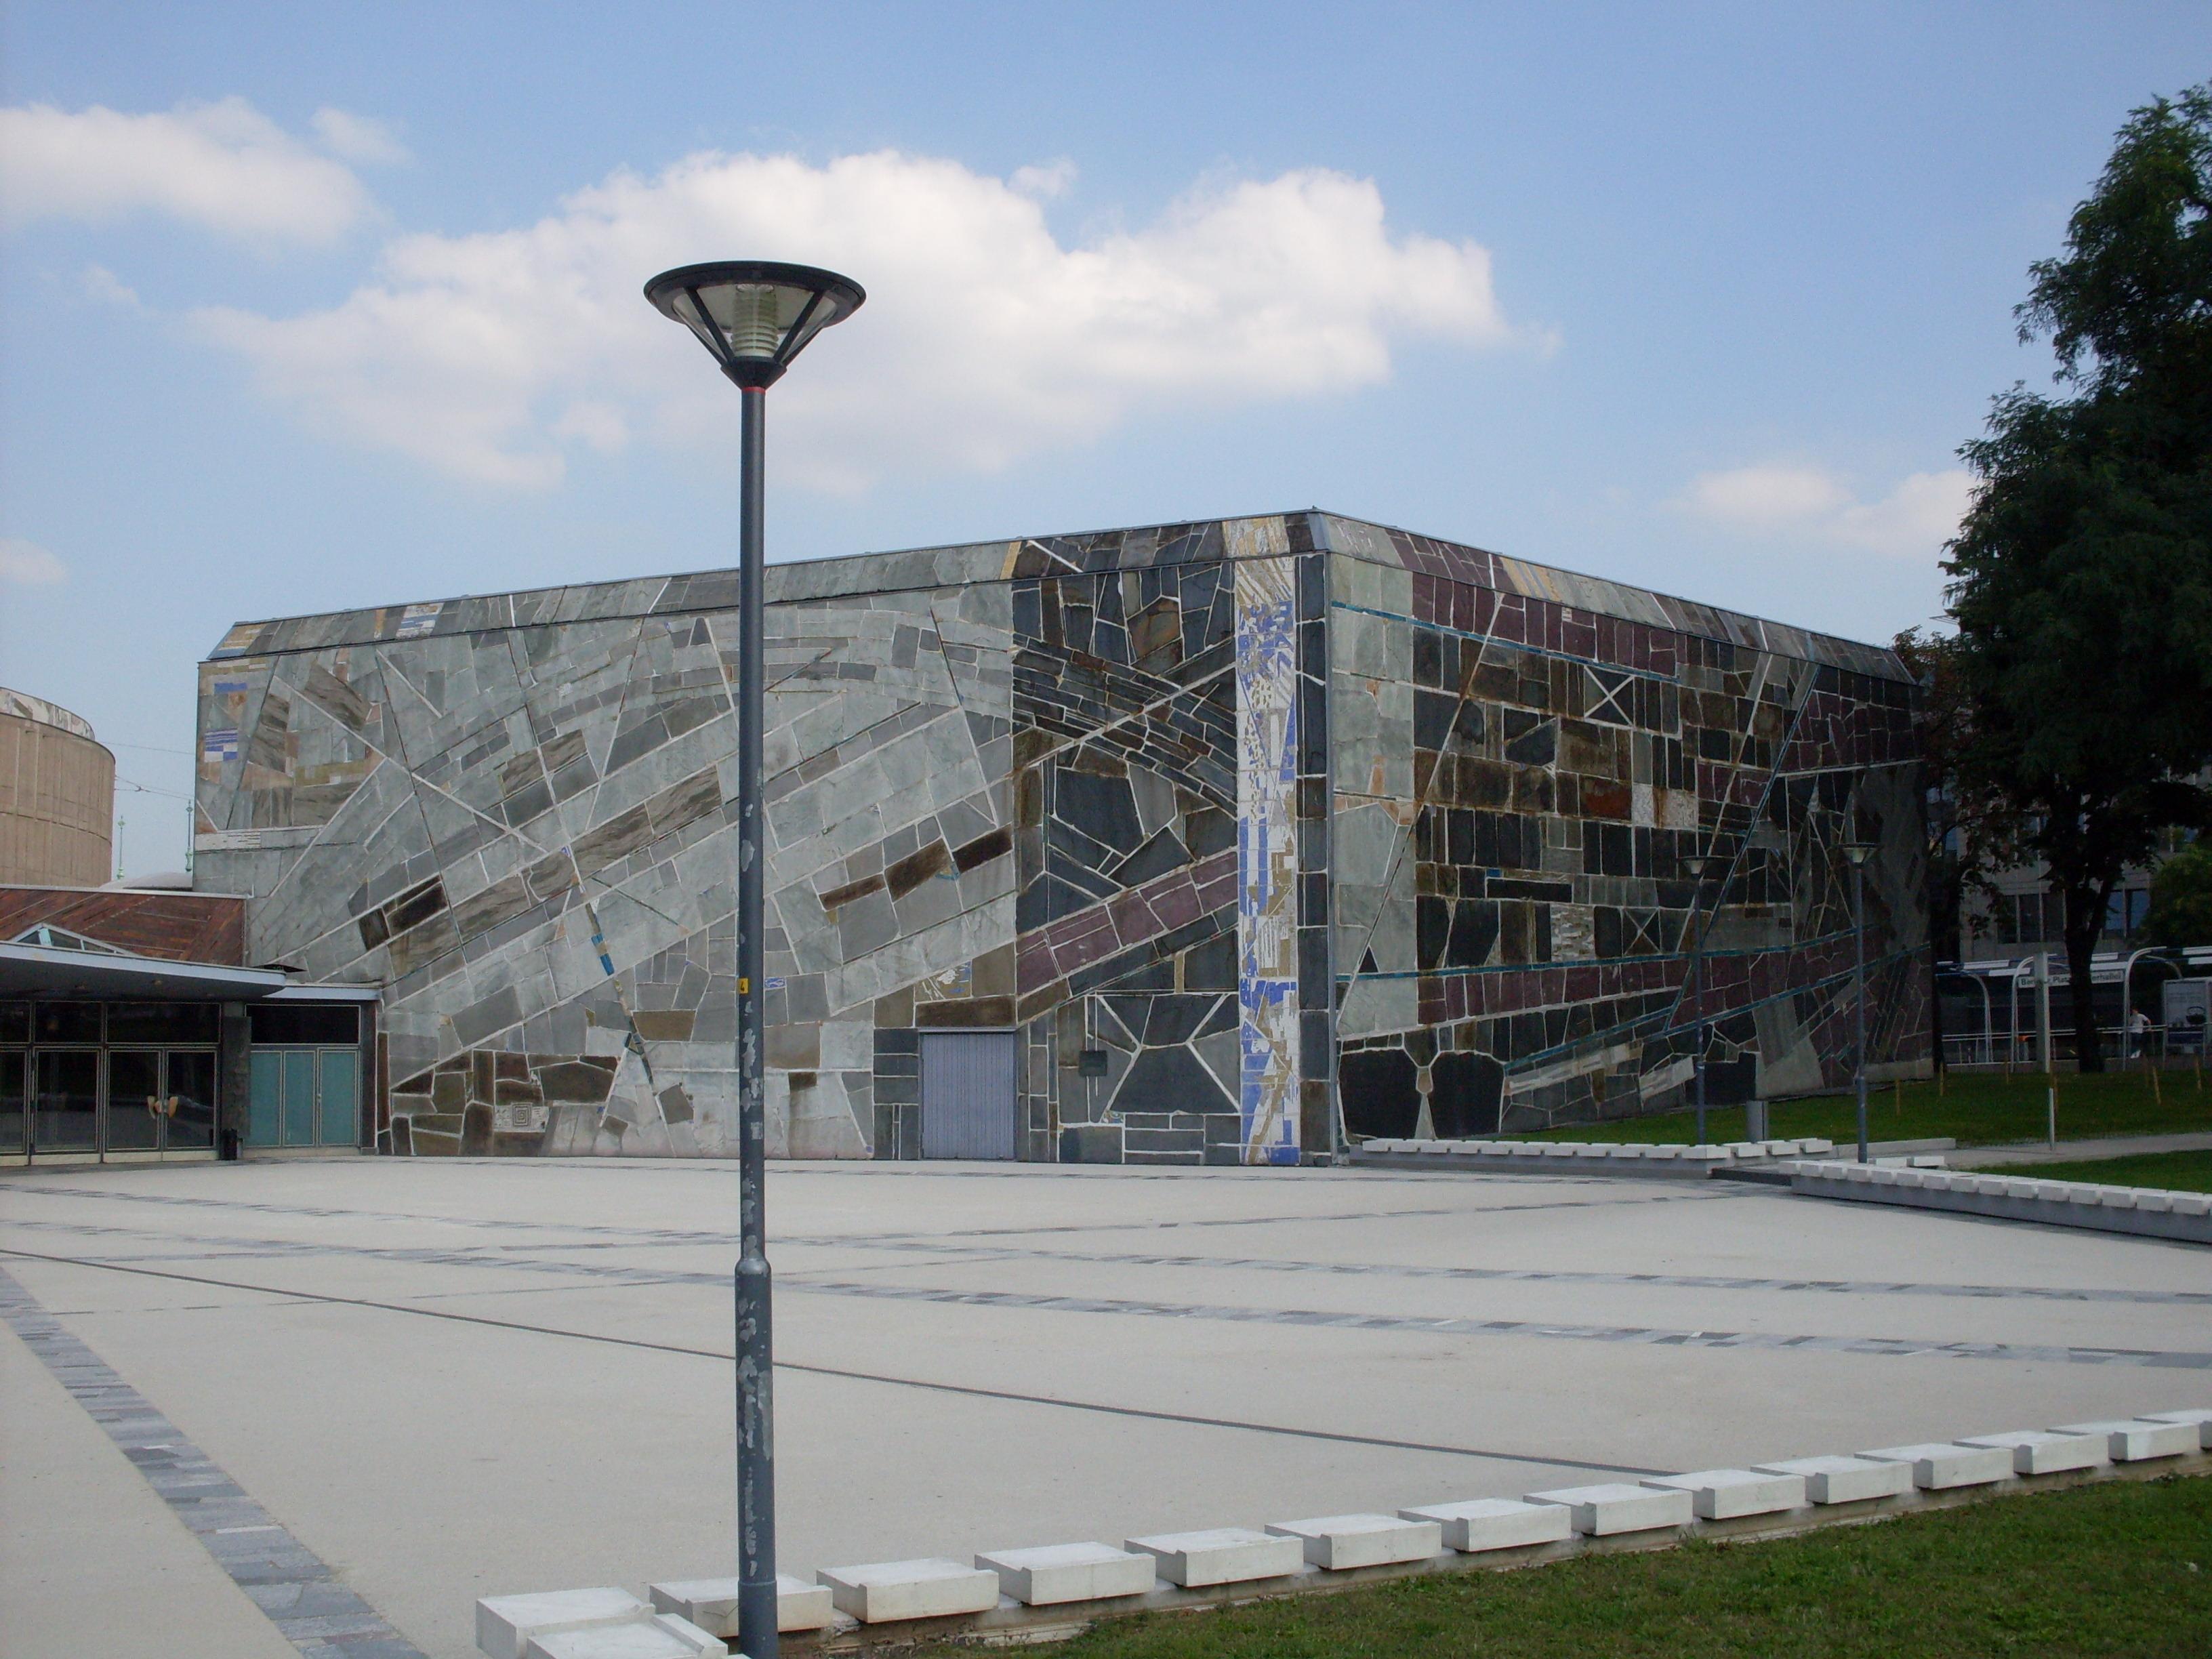 file liederhalle stuttgart berliner platz jpg wikimedia commons. Black Bedroom Furniture Sets. Home Design Ideas